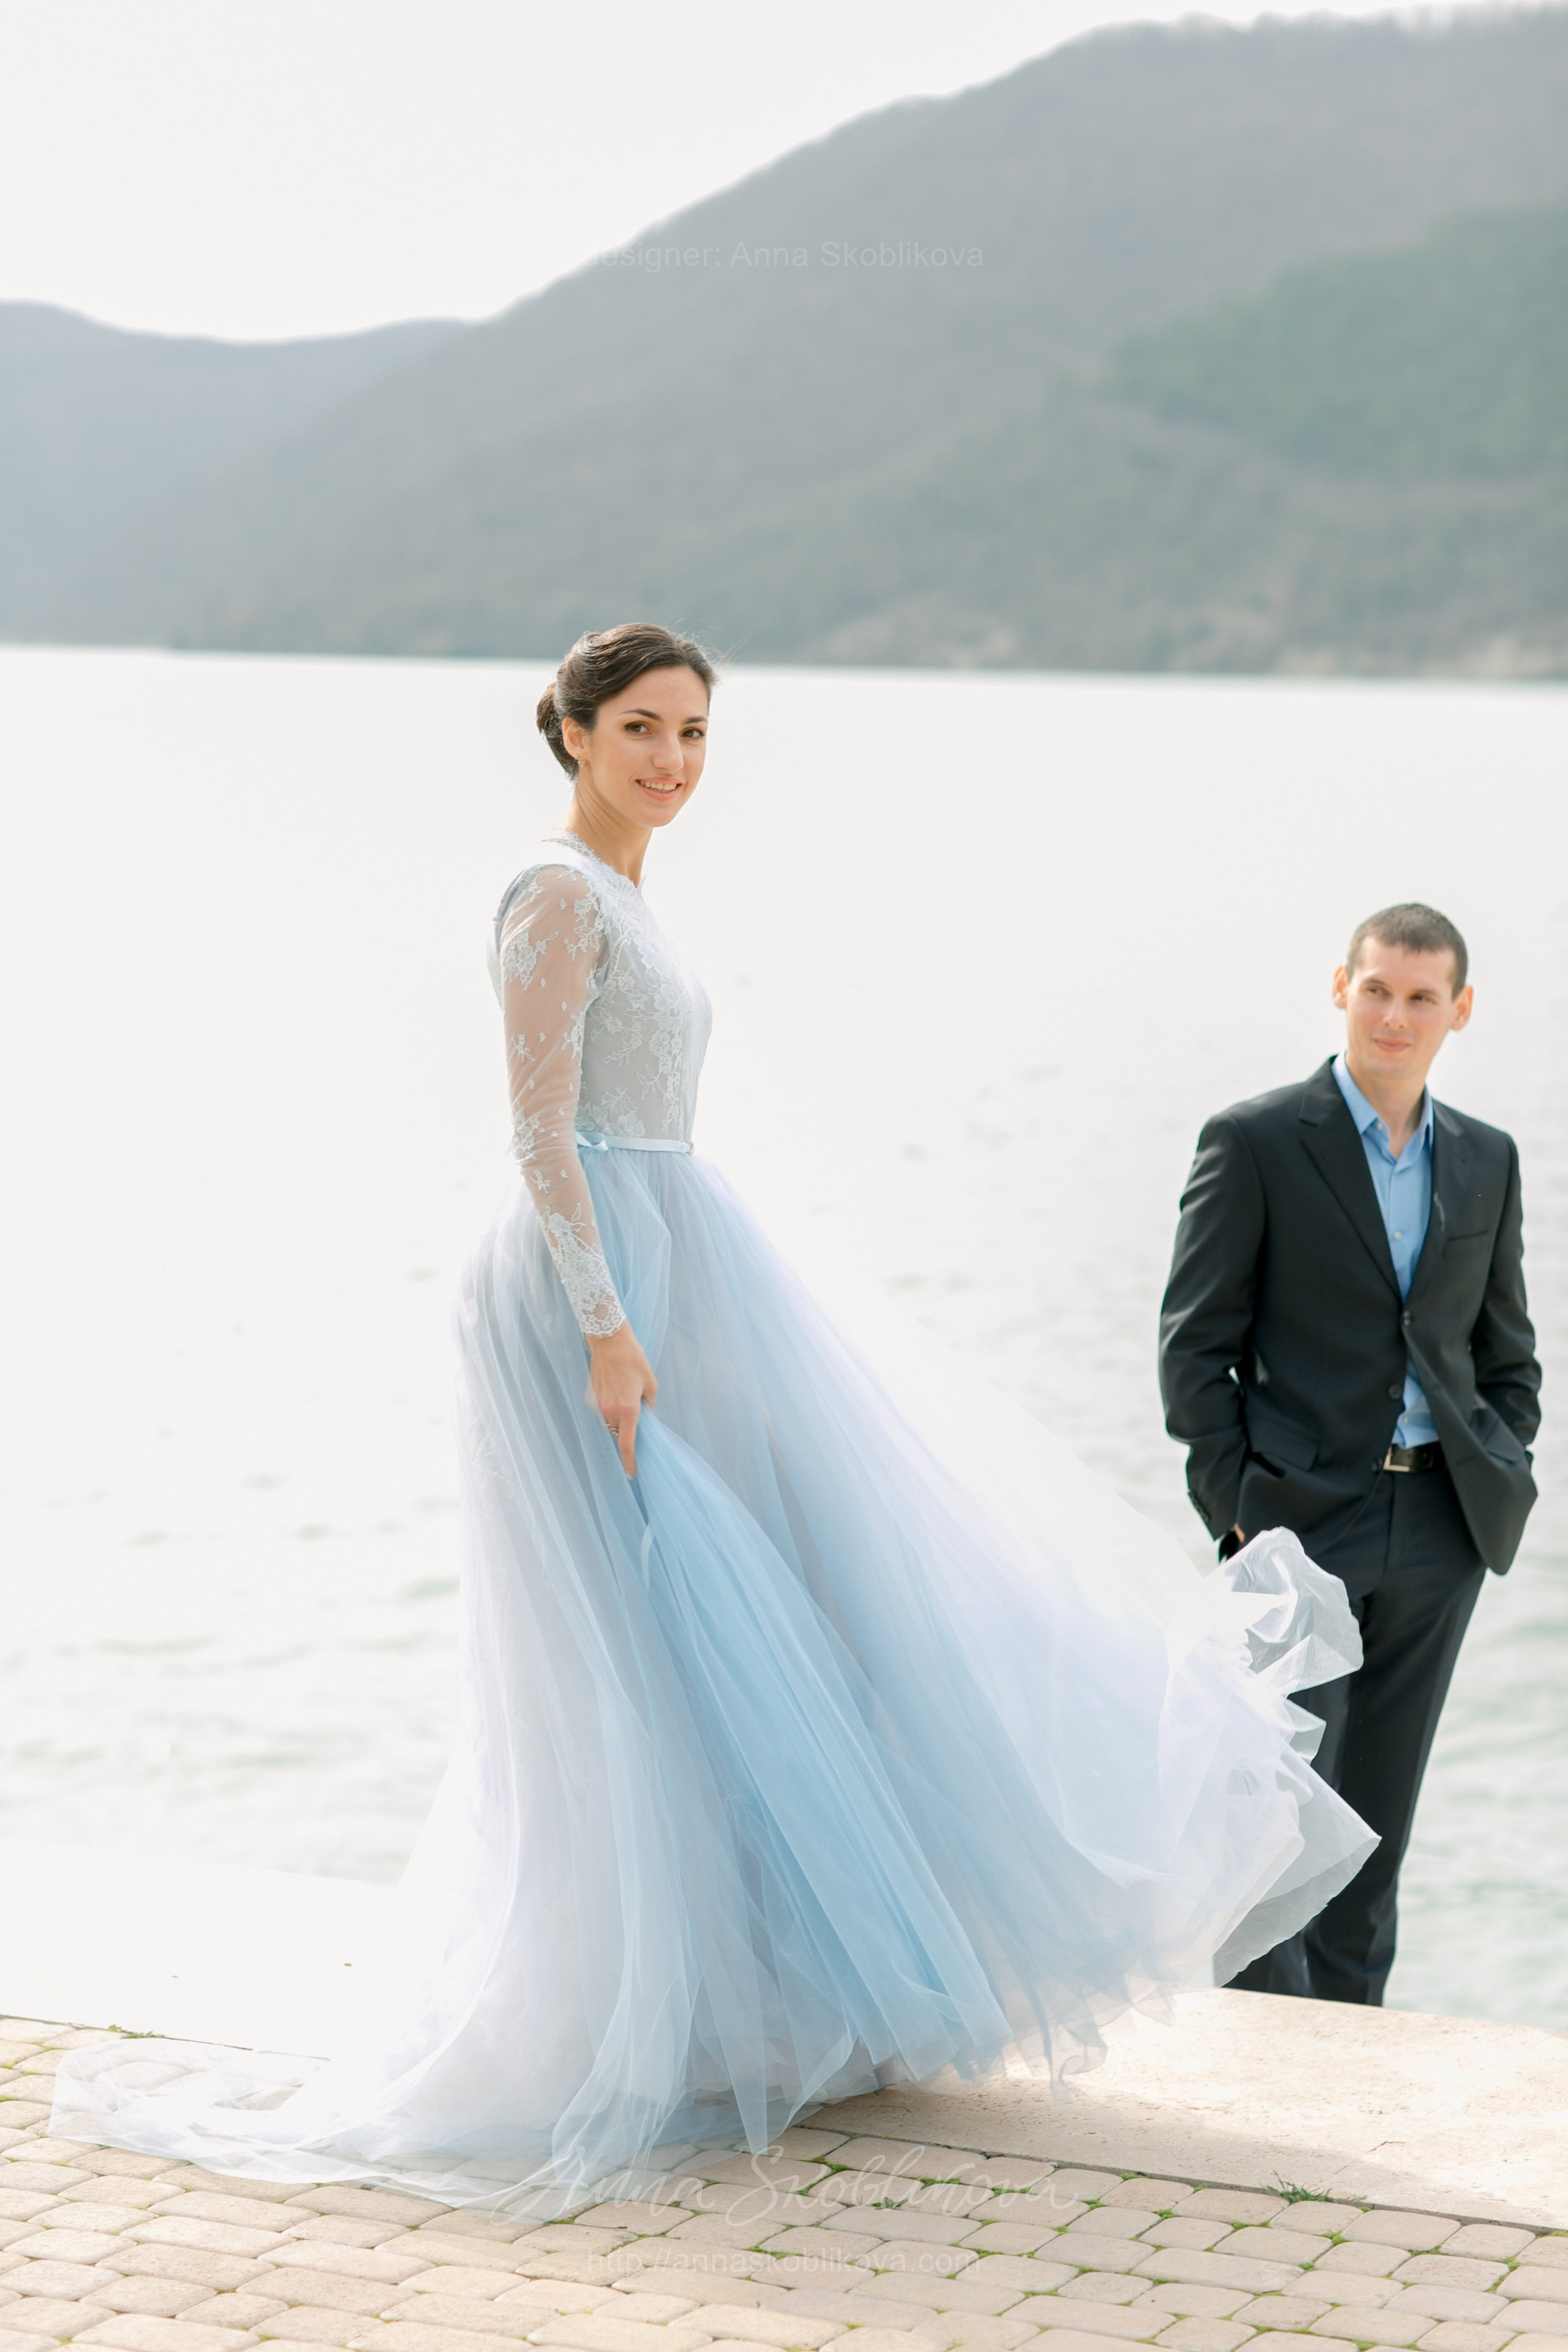 Light Blue Wedding Gown | Anna Skoblikova - Wedding Dresses ...